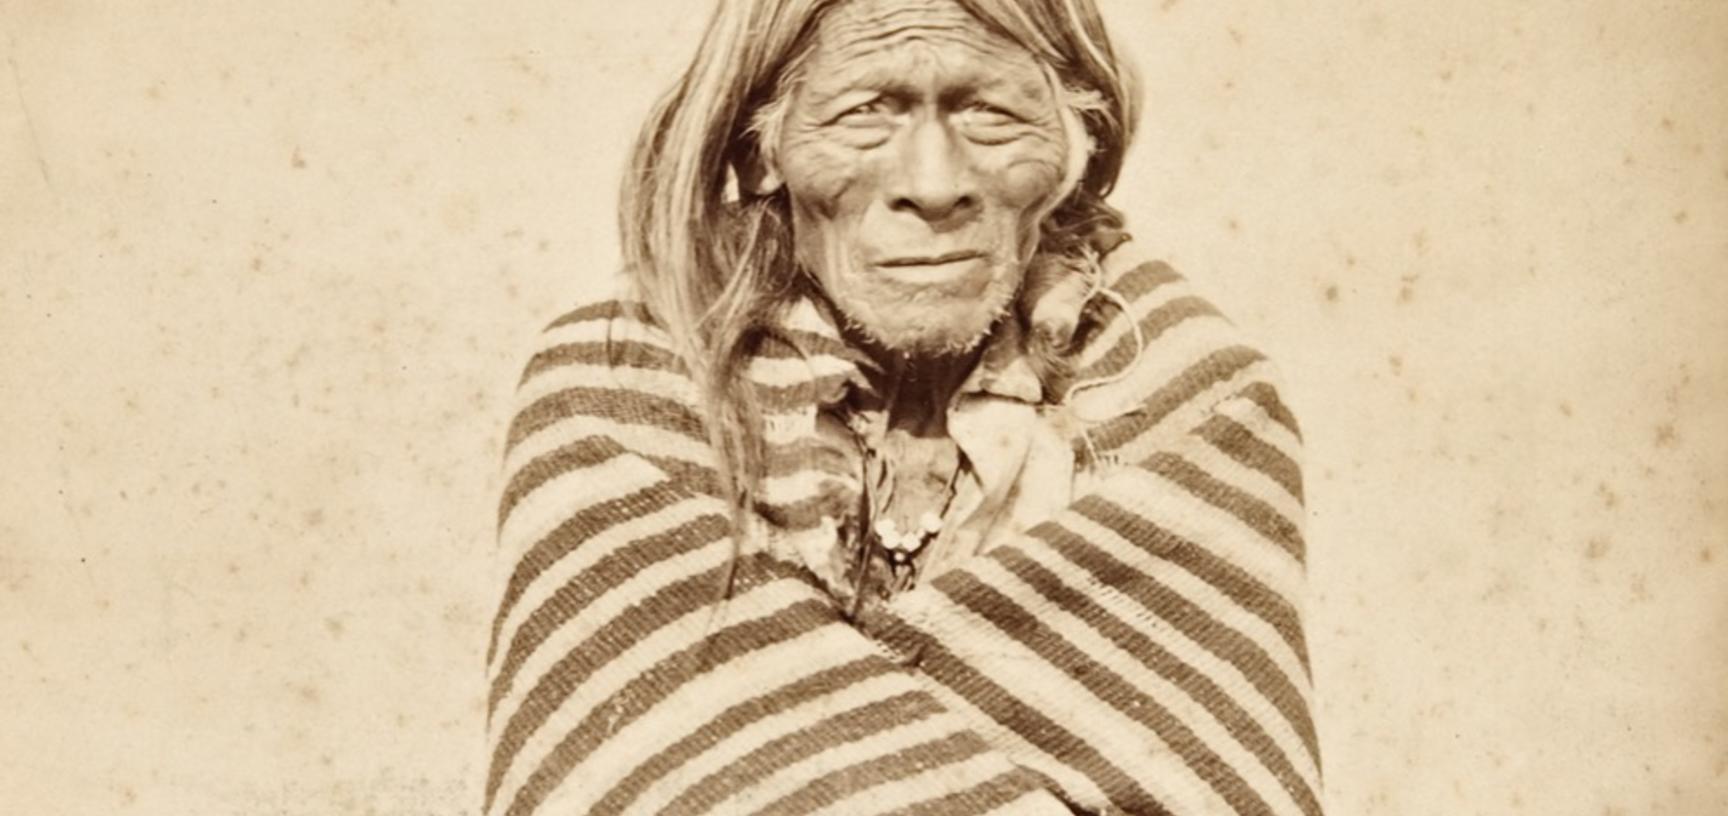 Portrait of an elderly man named Wahu Tota.